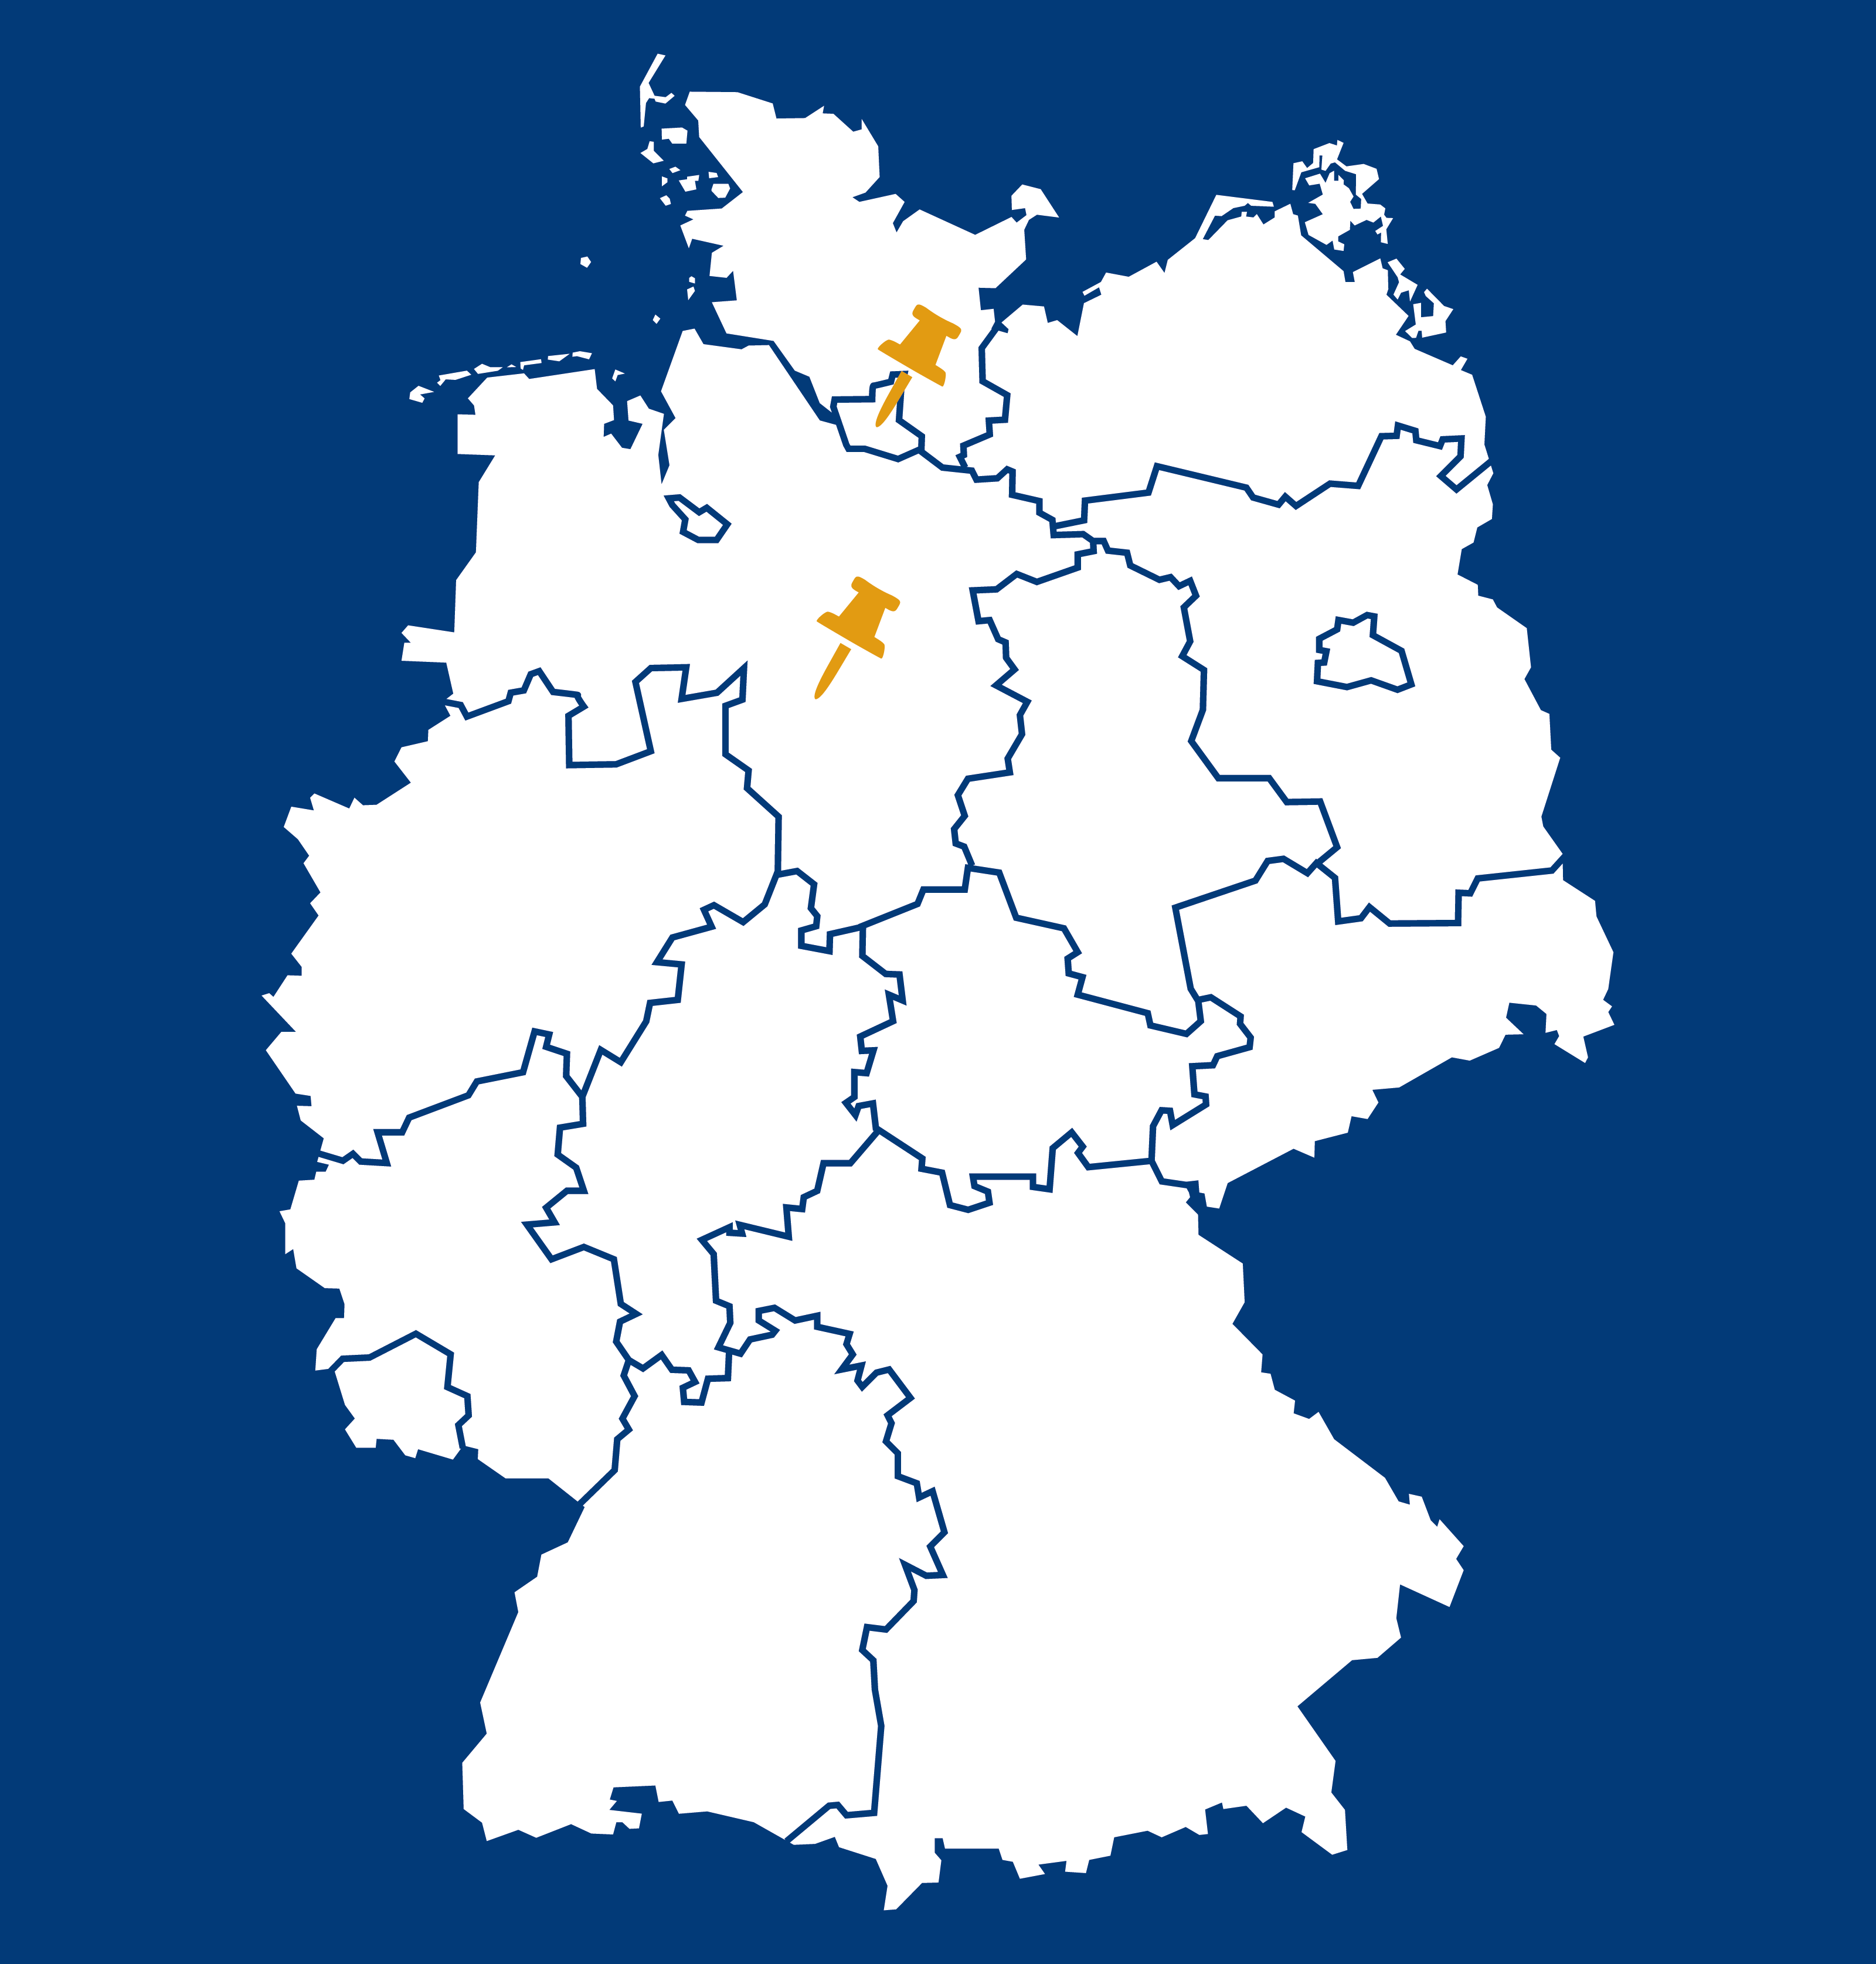 IT Security Hamburg - LargeNet GmbH